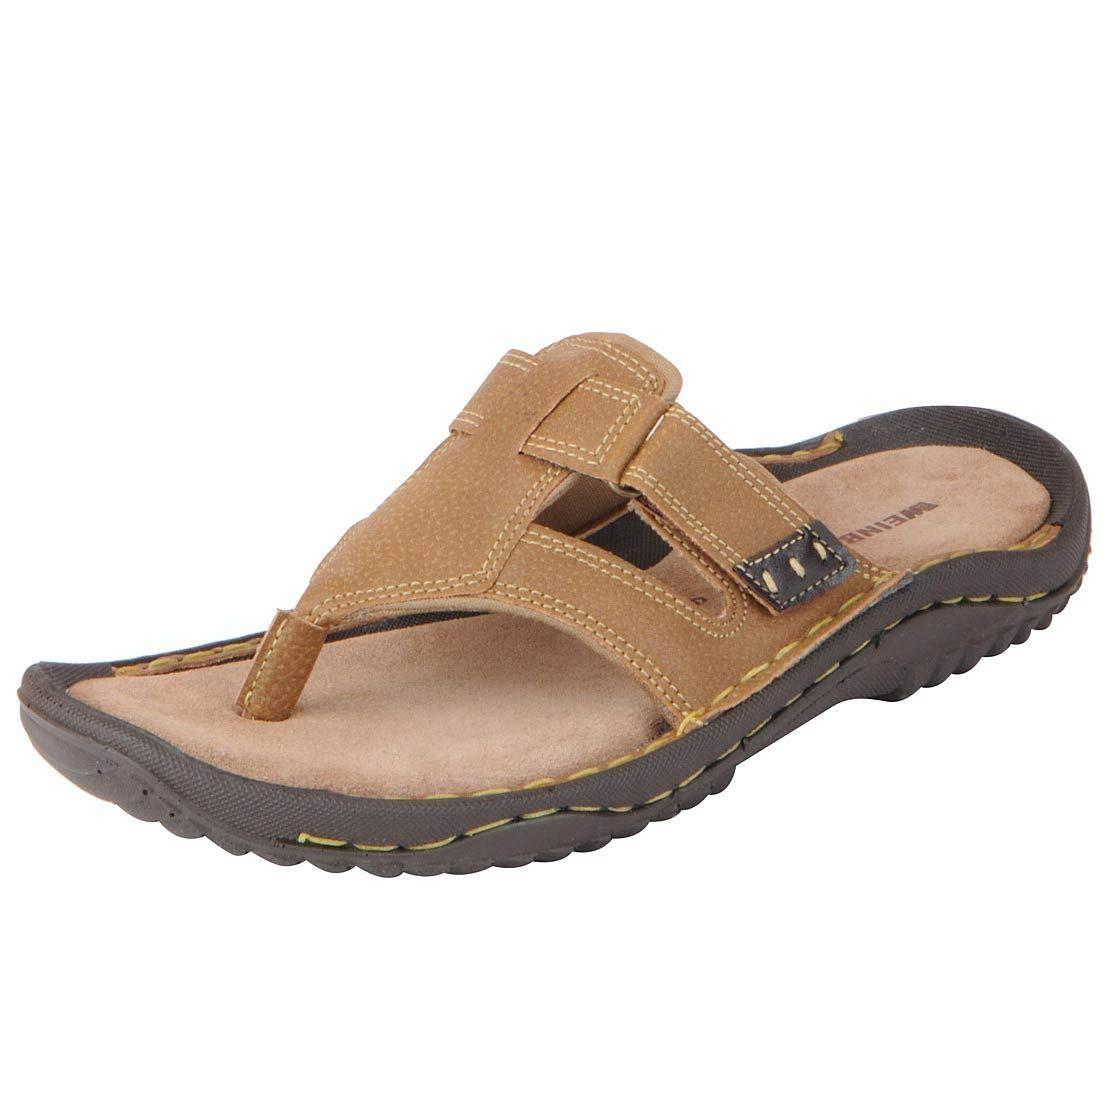 Buy BATA Men's Casual Sandals at Amazon.in